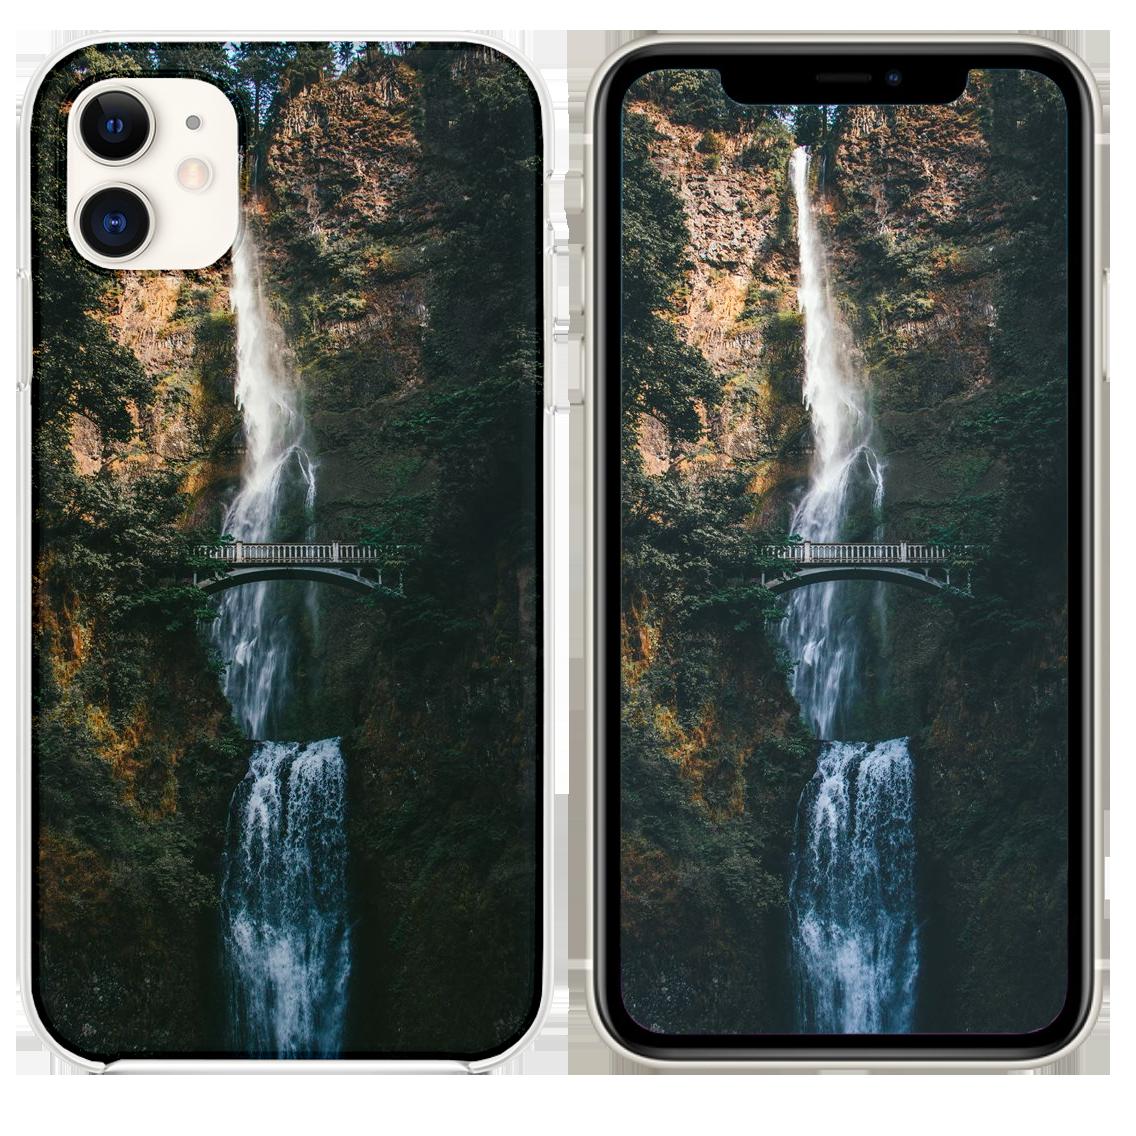 Multnomah Falls Iphone 11 Case Iphone 11 Iphone Multnomah Falls